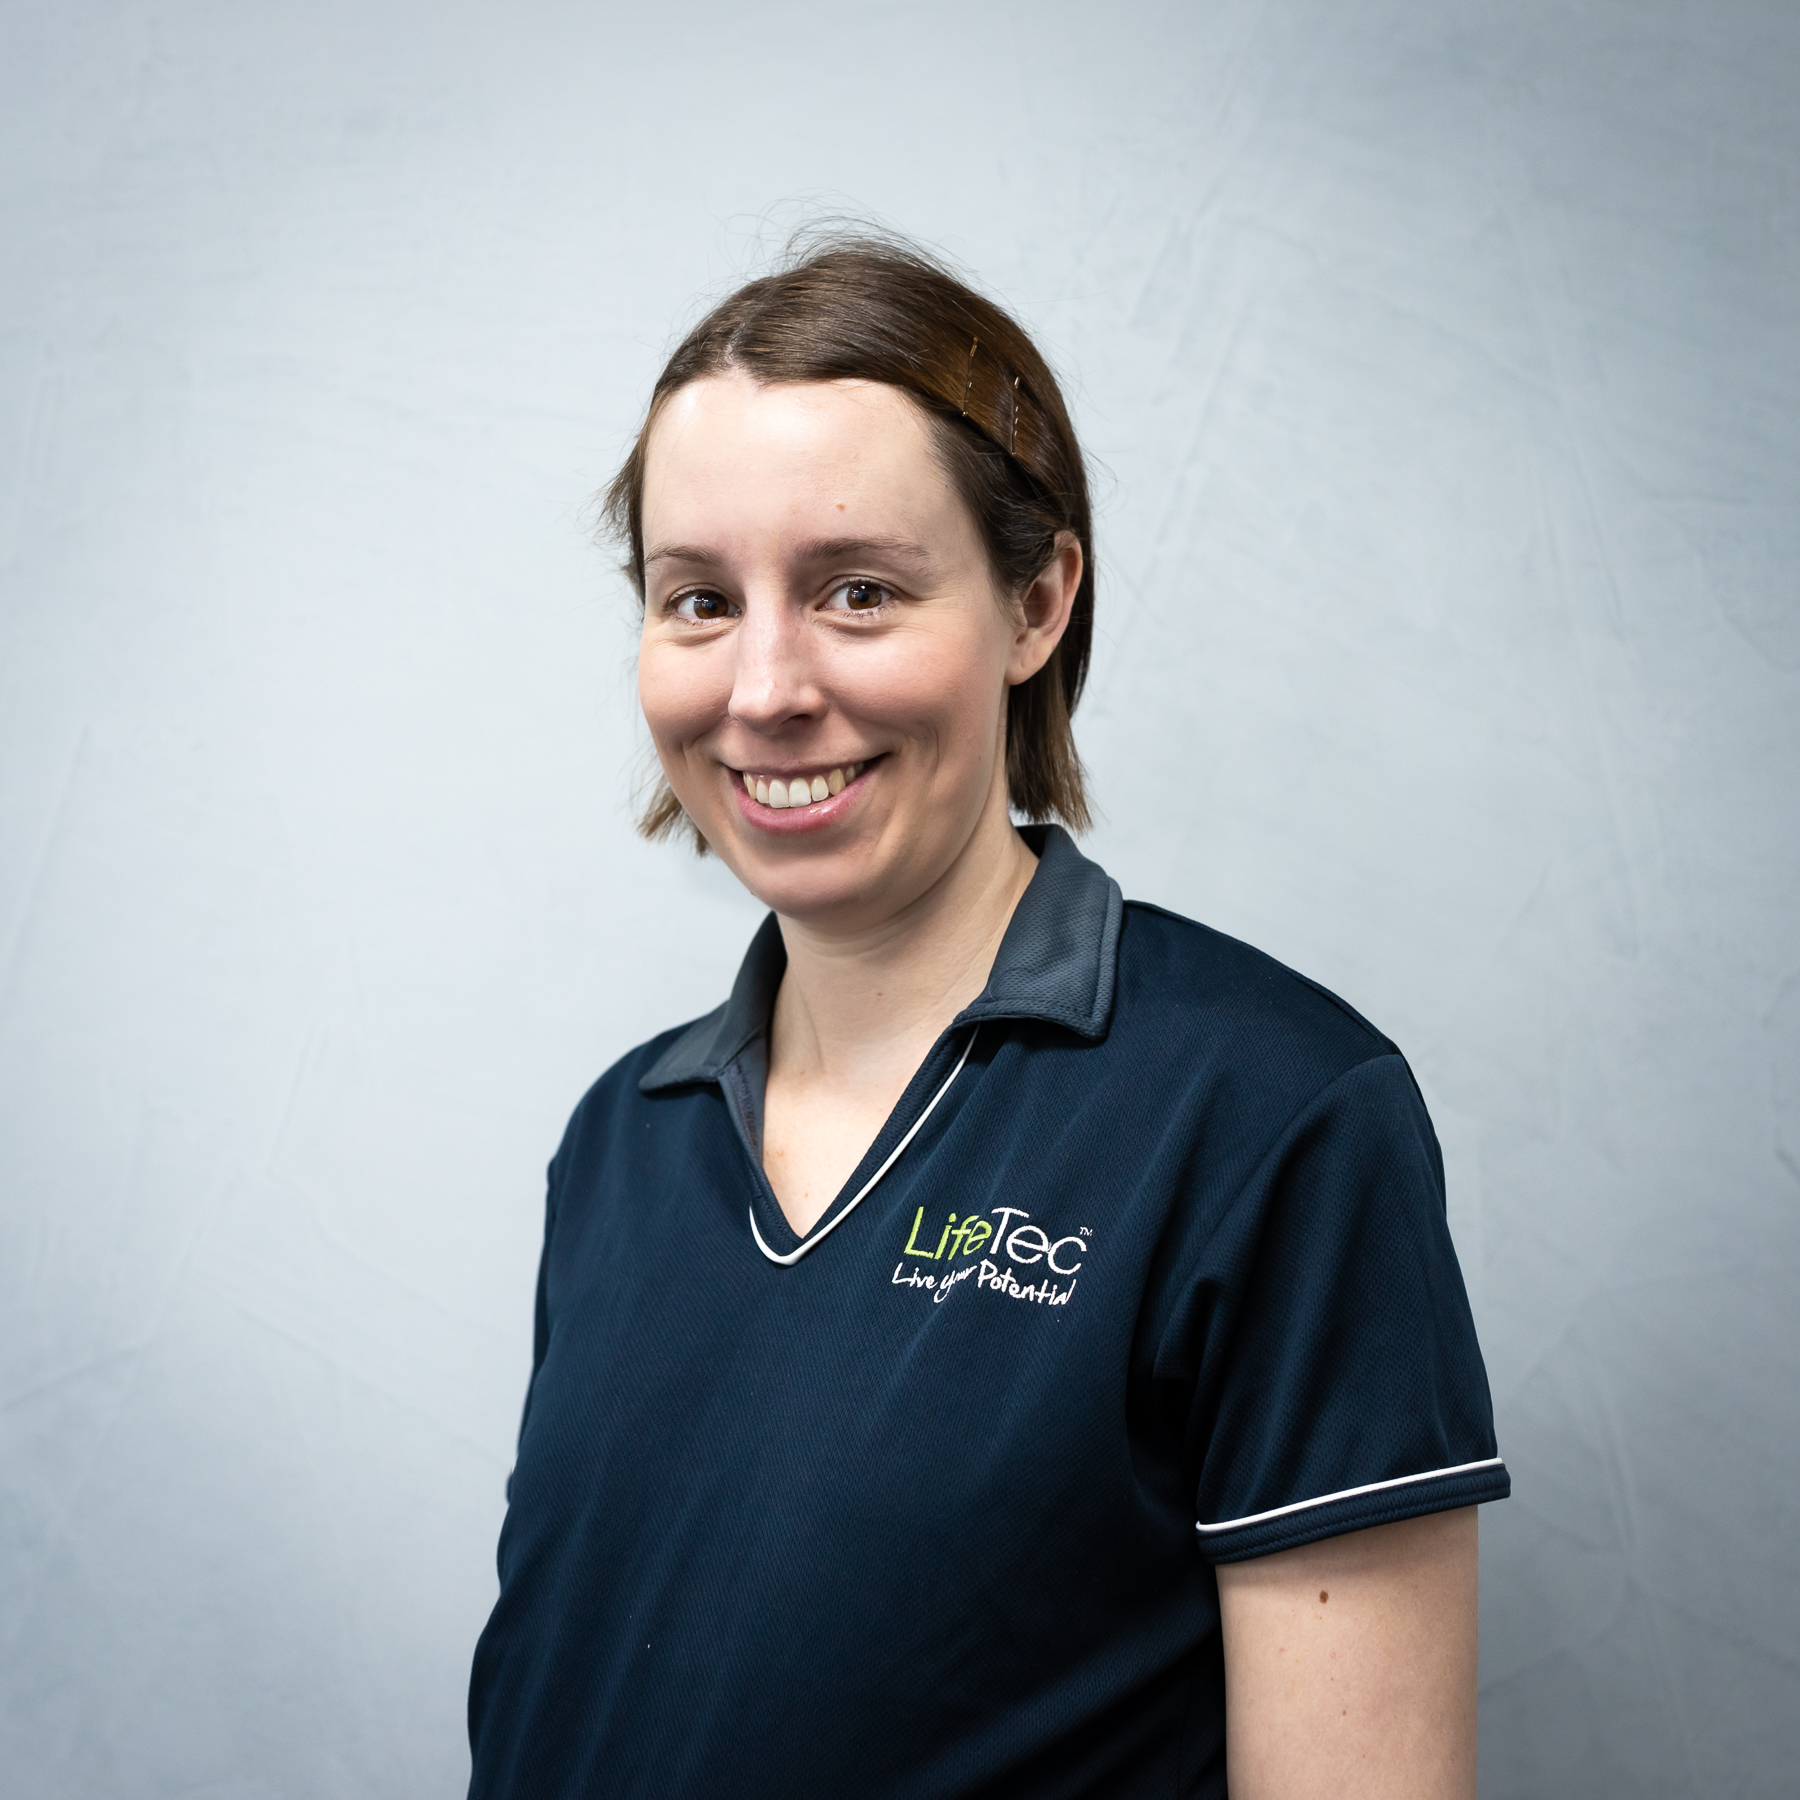 Brooke- occupational therapist